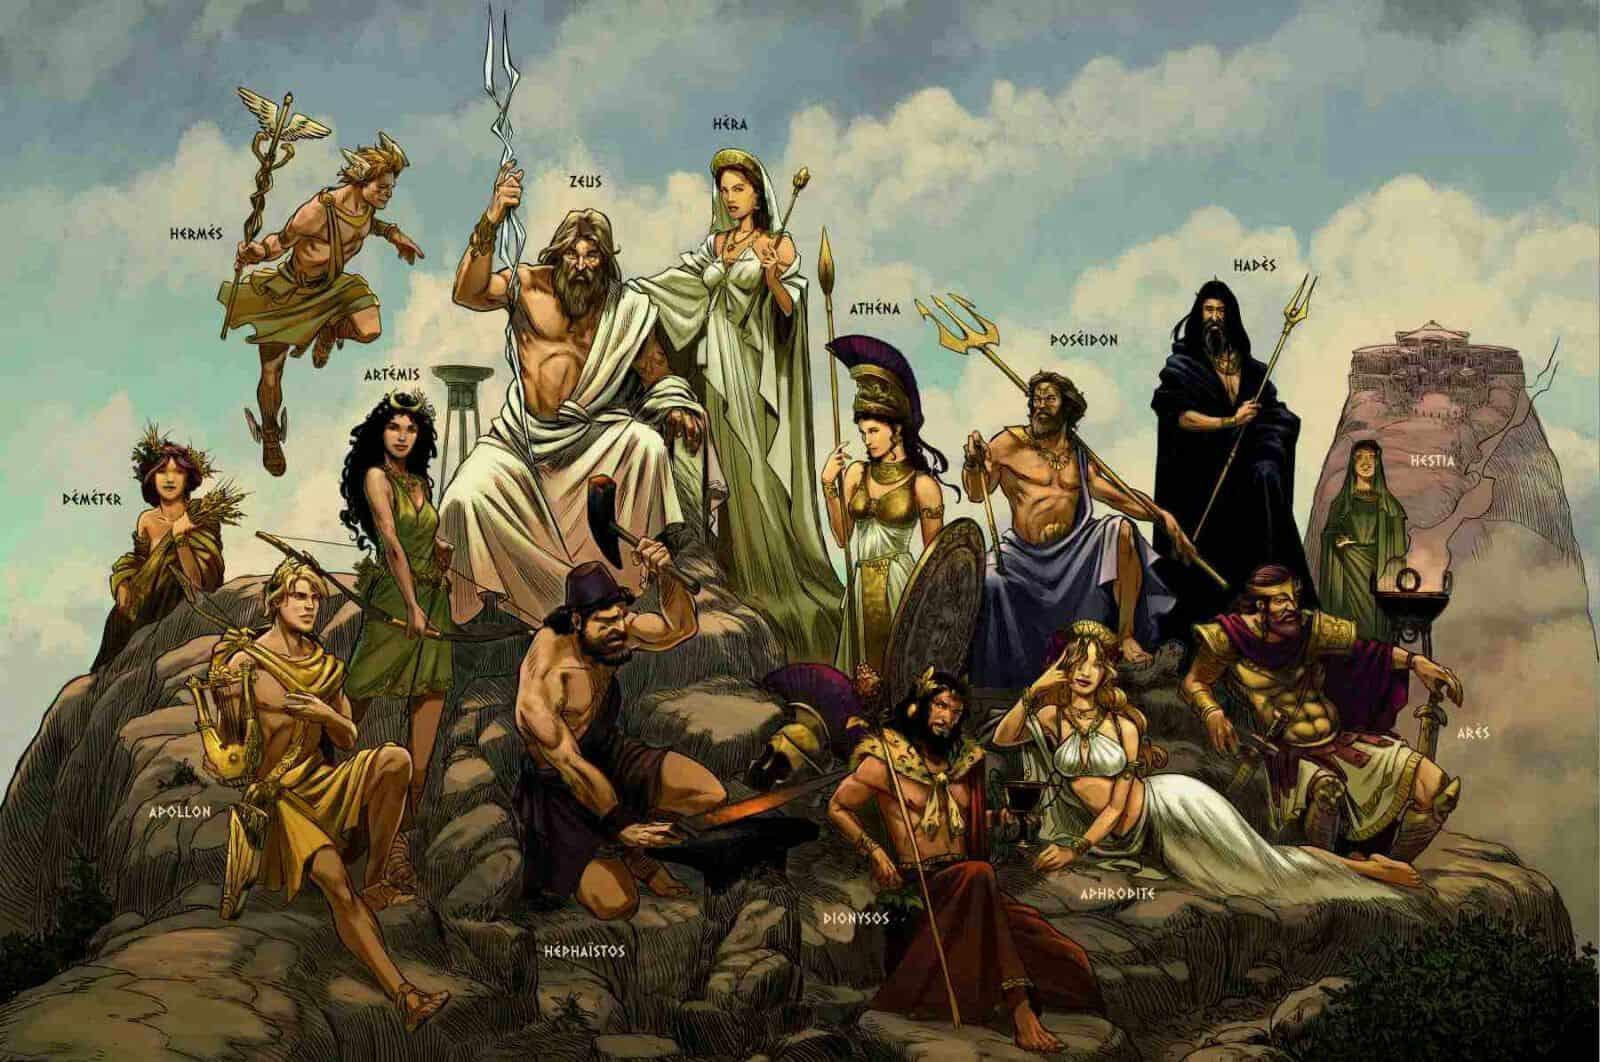 Truly Intense Vengeance Stories From Greek Mythology